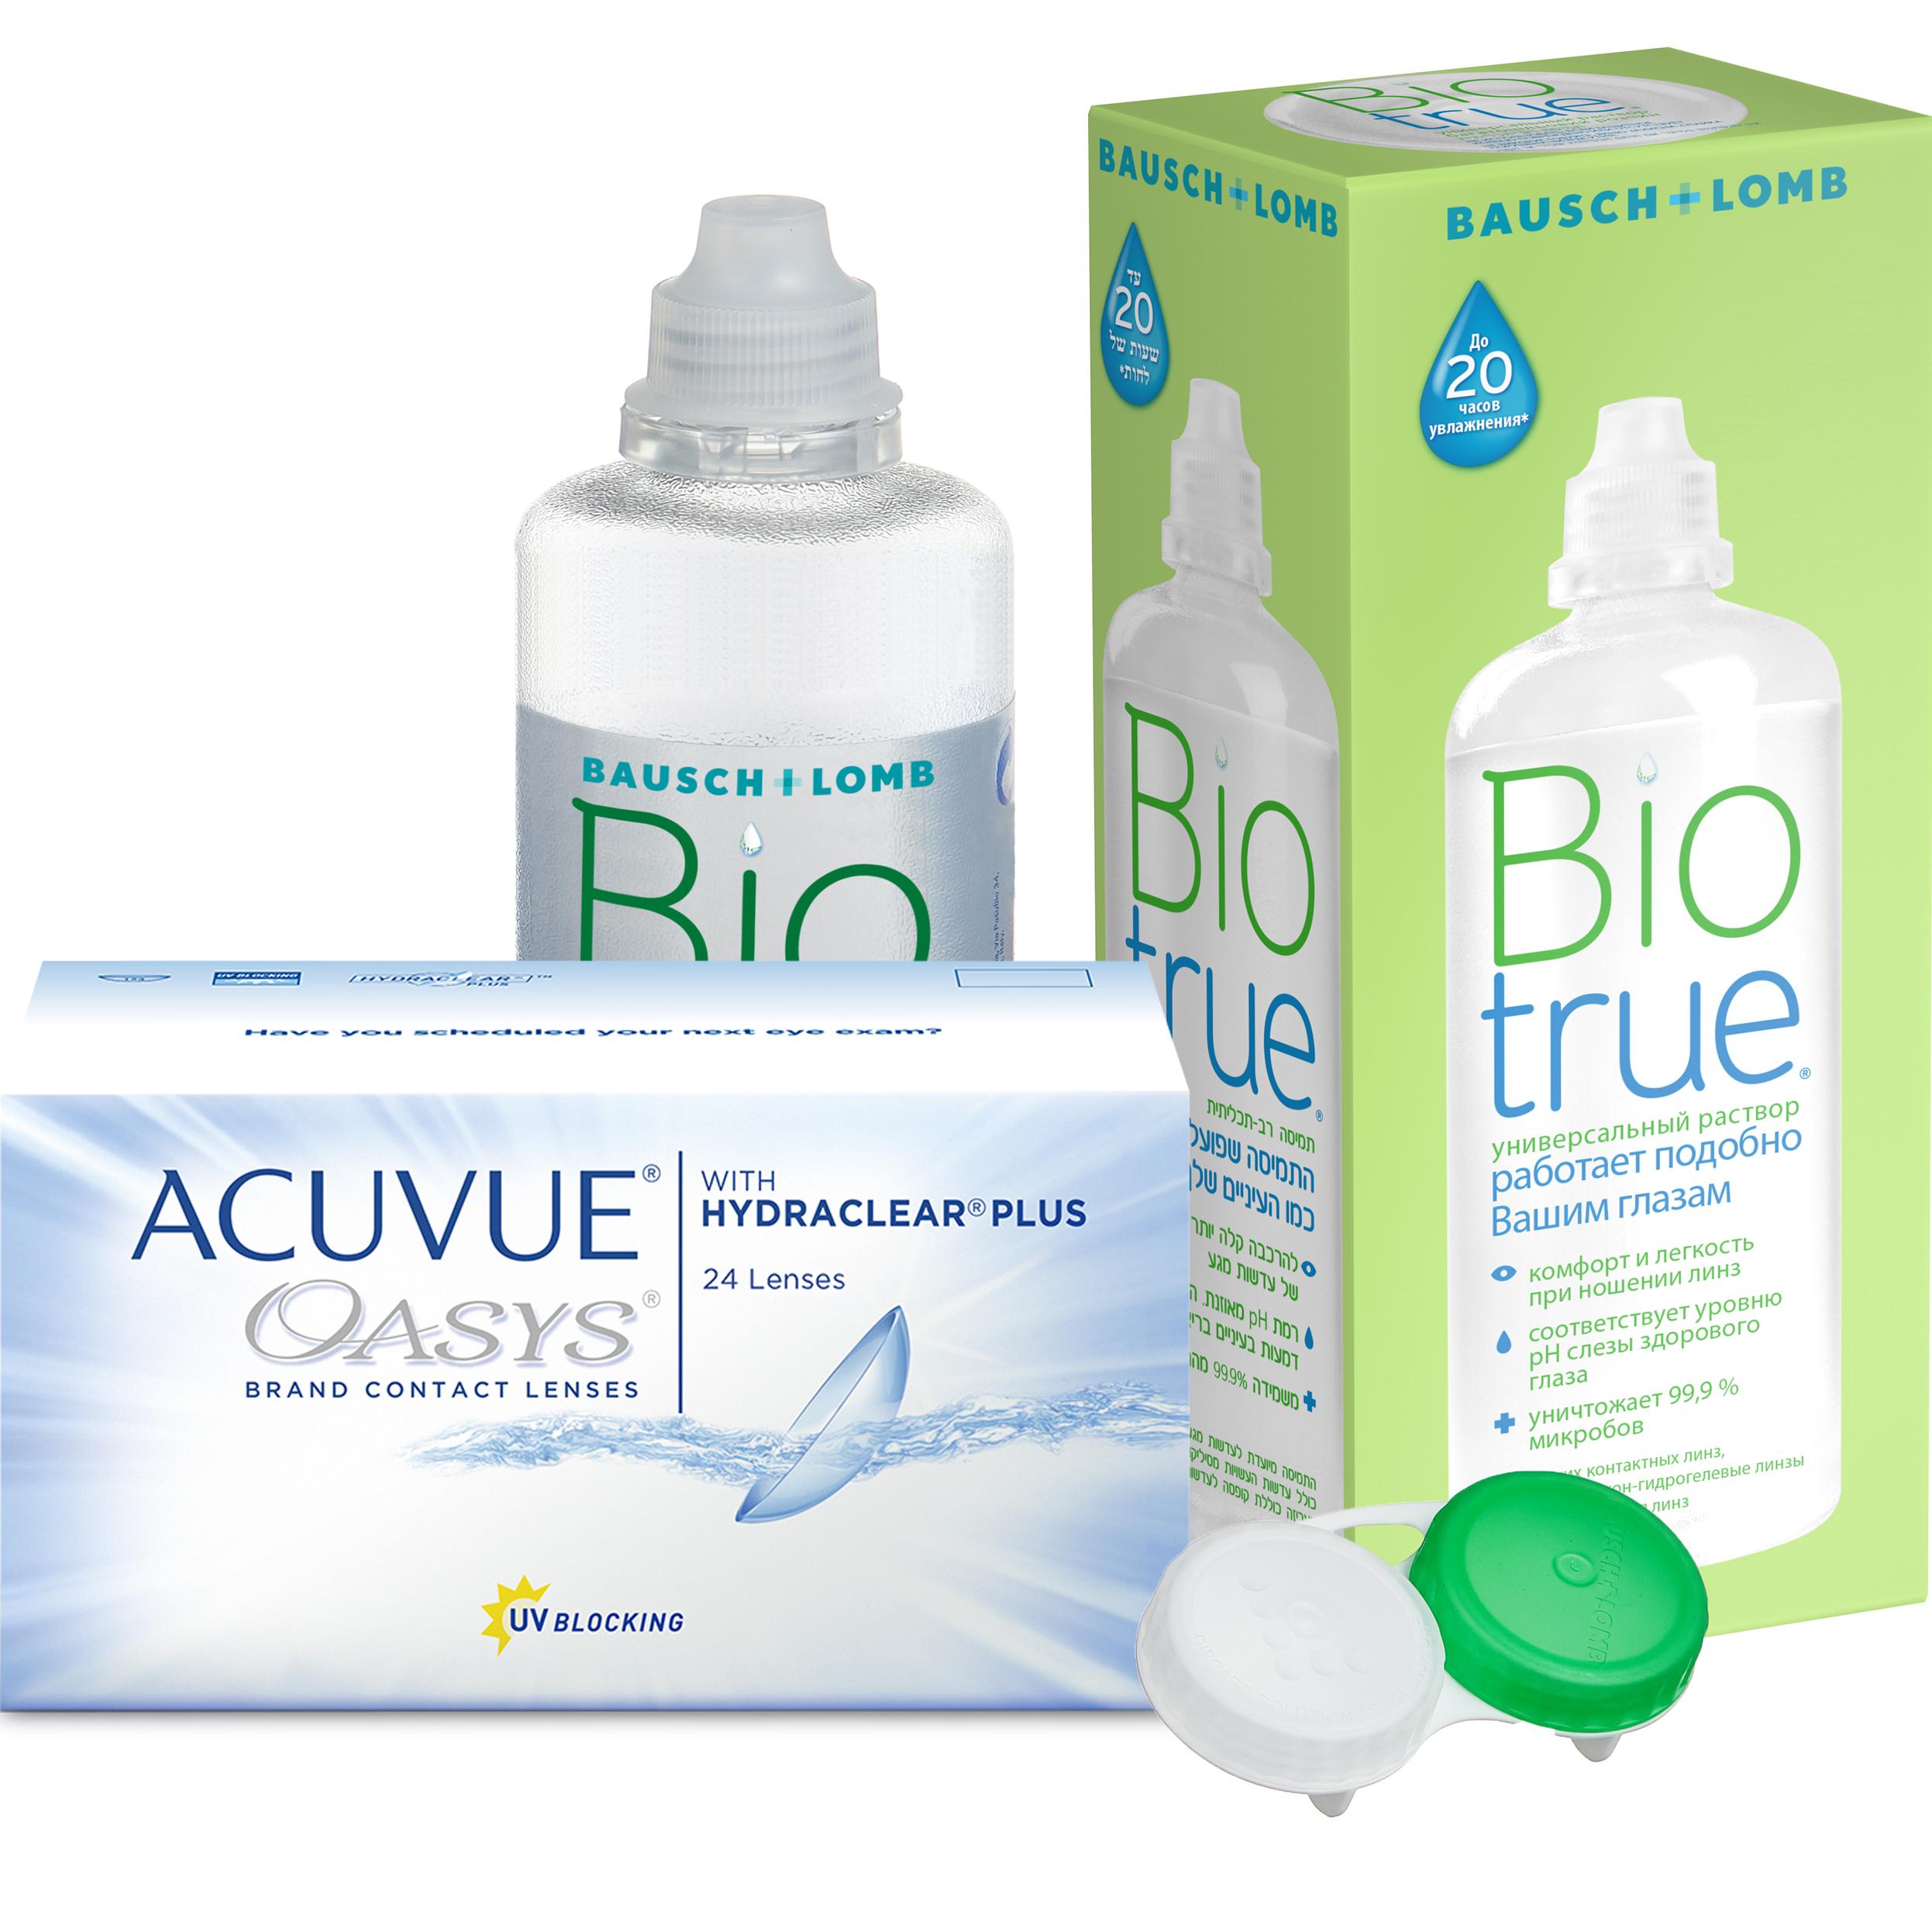 Купить Oasys with Hydraclear Plus 24 линзы + Biotrue, Контактные линзы Acuvue Oasys with Hydraclear Plus 24 линзы R 8.8 -5, 75 + Biotrue 300 мл